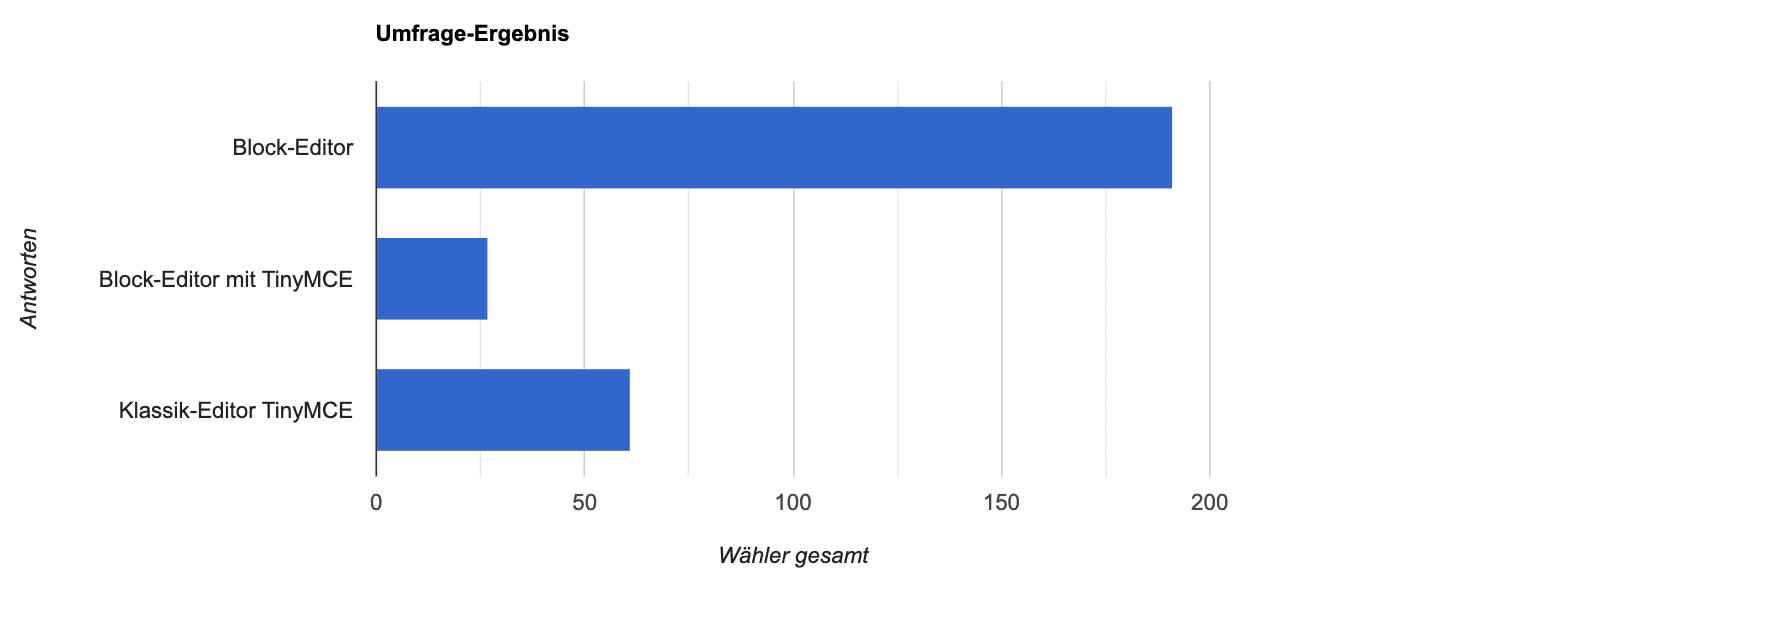 Block- vs. Classic-Editor insgesamt 279 Stimmen